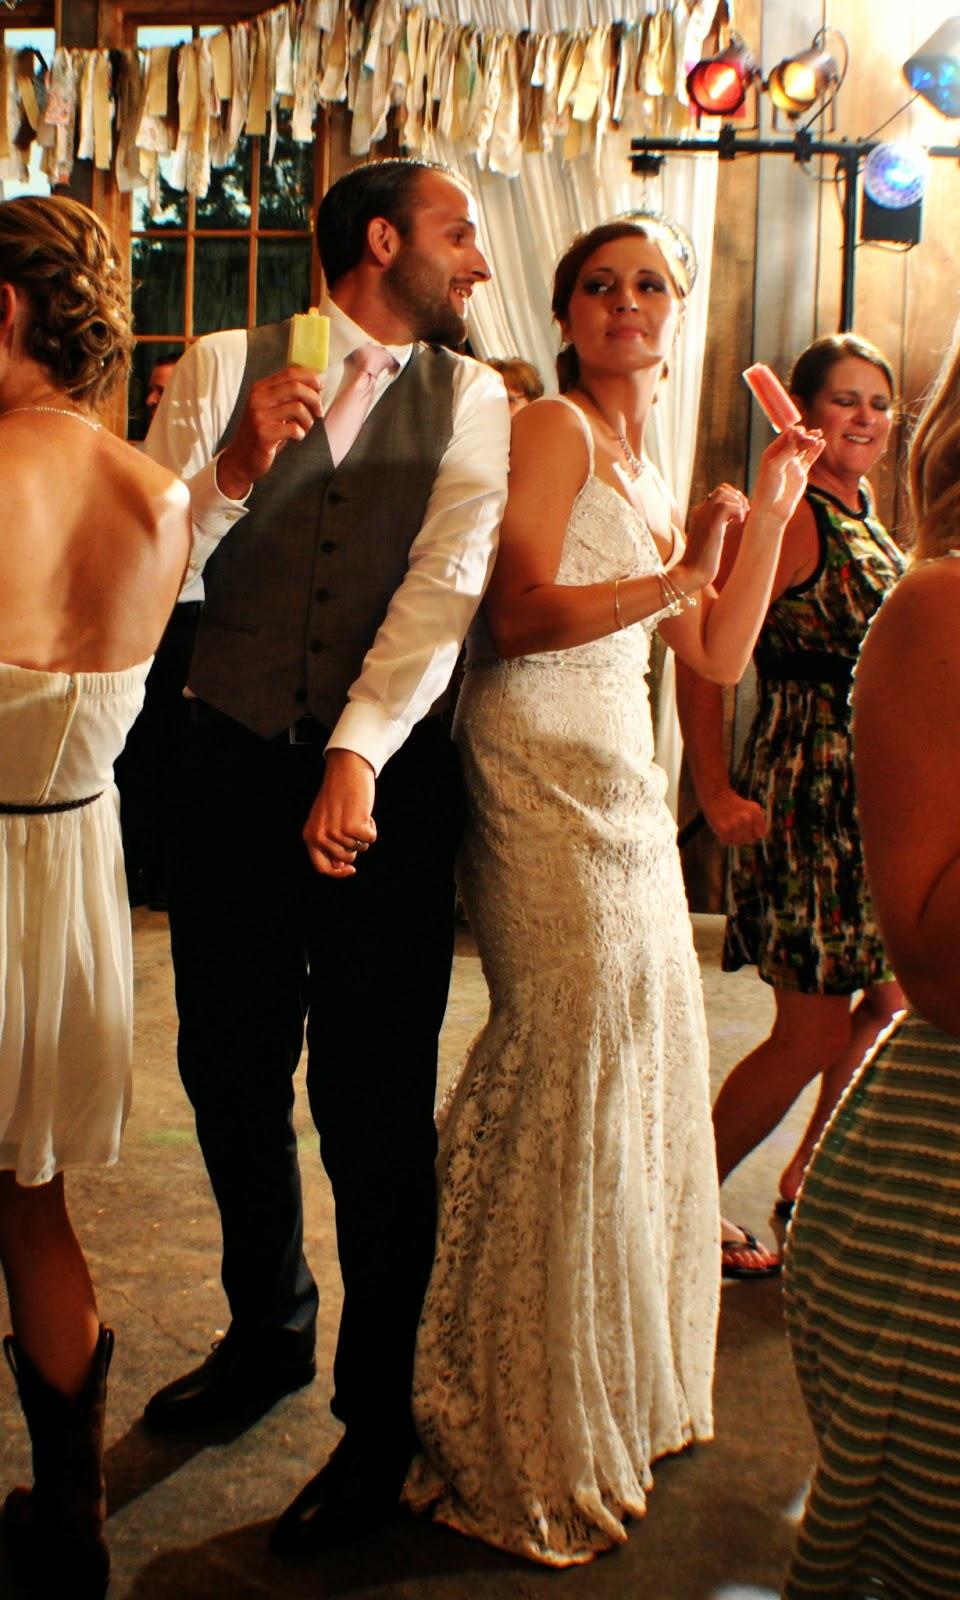 With Class LLC Wedding Coordination Party DJ - The Barn at High Point Farms - Flintstone, GA